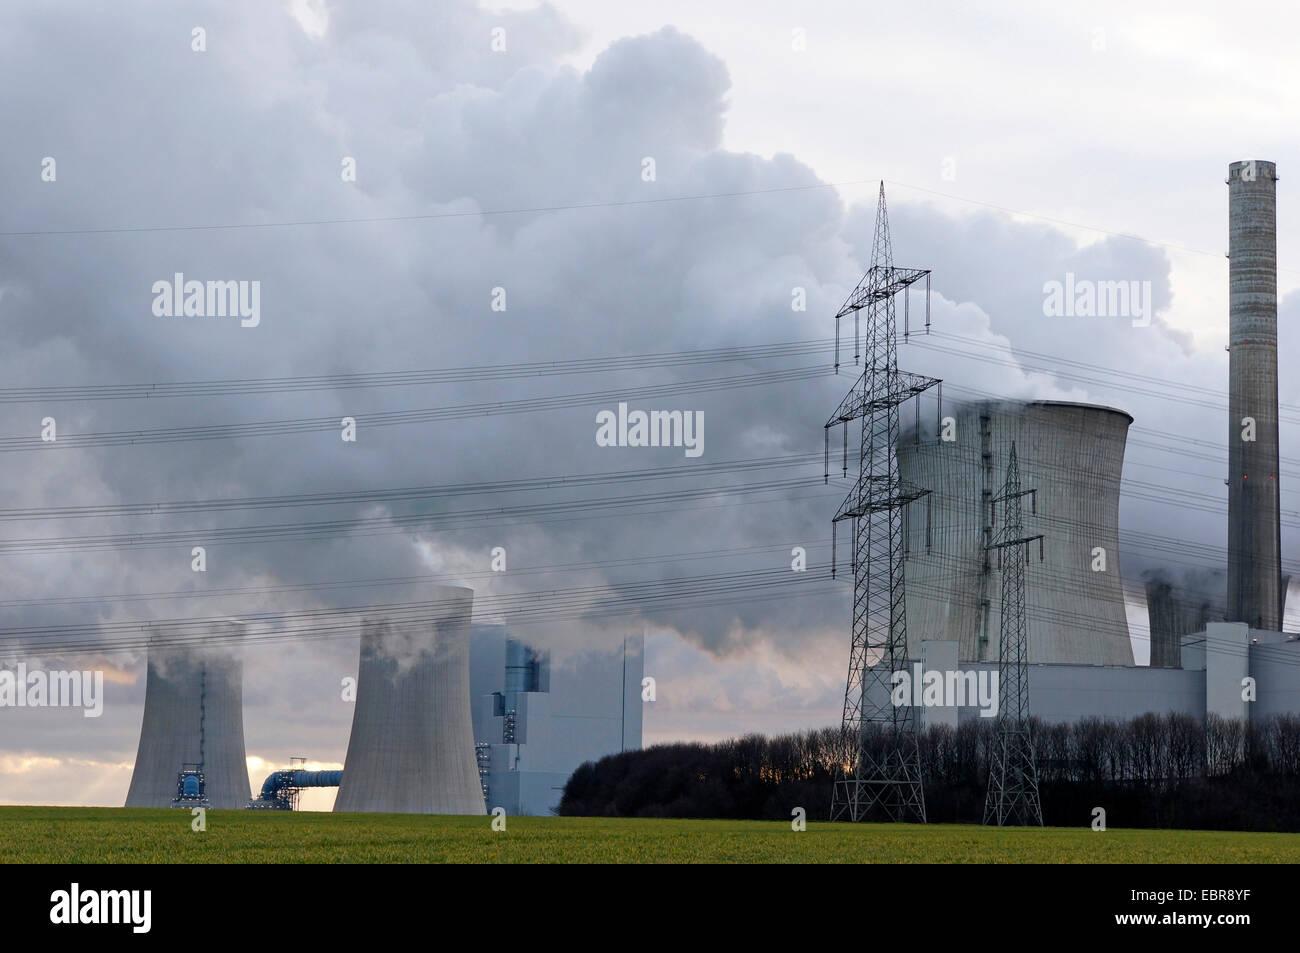 Neurath Power Station of the Rhenish lignite mining region, Germany, North Rhine-Westphalia, Neurath, Grevenbroich - Stock Image